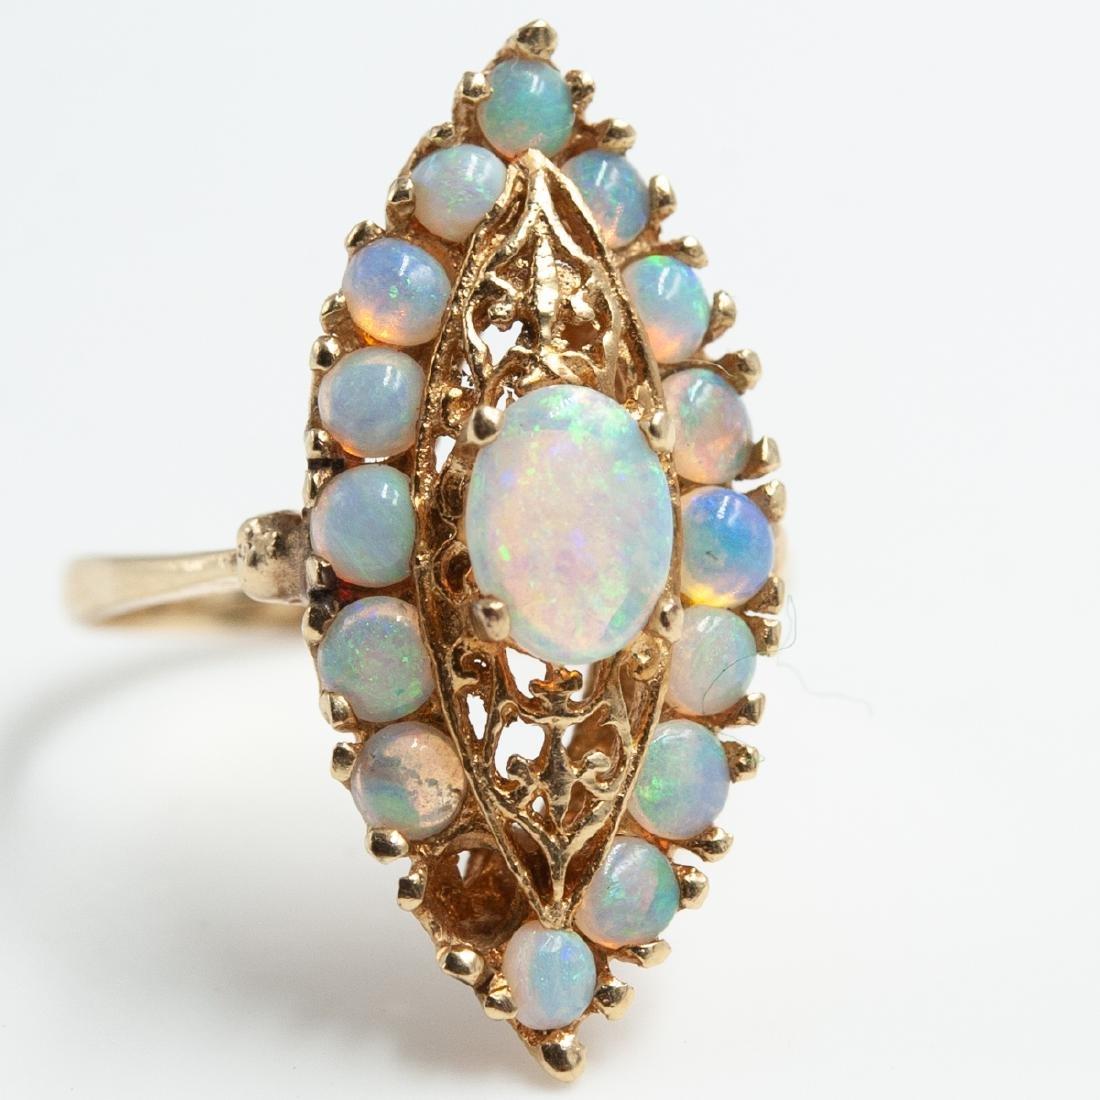 14K Gold & Opal Jewelry Set - 3